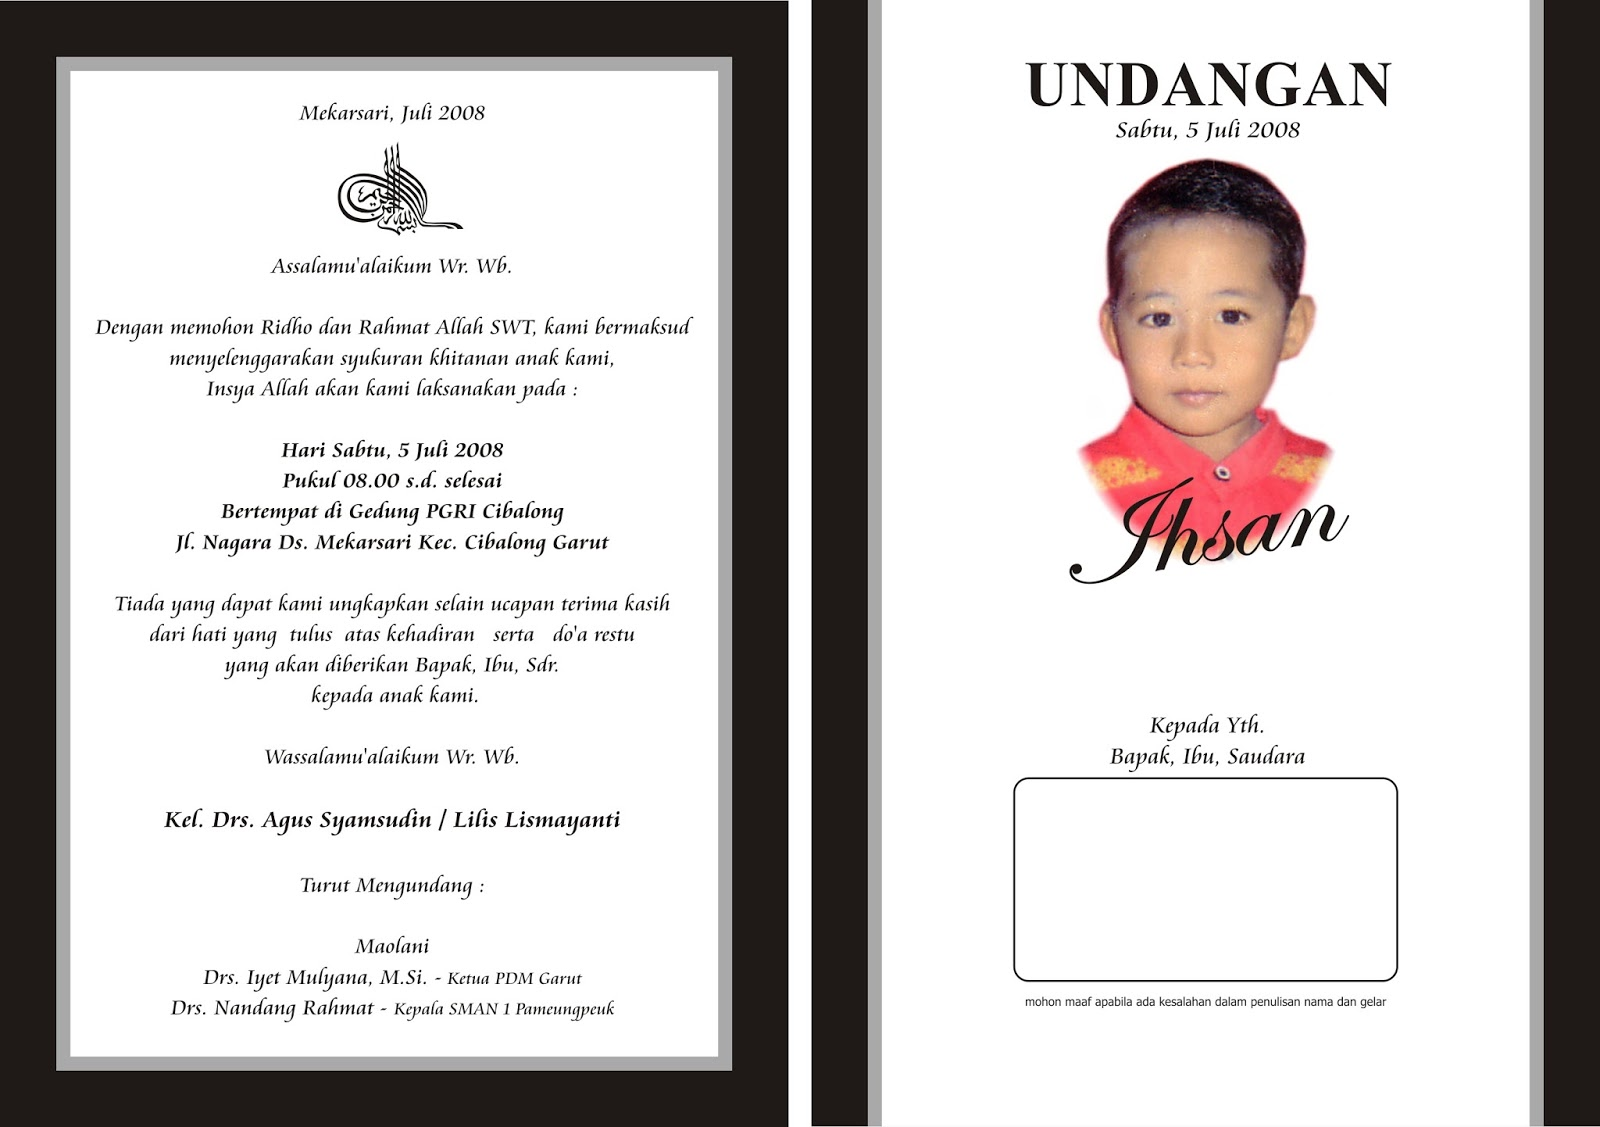 Kartu Undangan Undangan Khitanan Bahasa Indonesia Ukuran 14 X 20